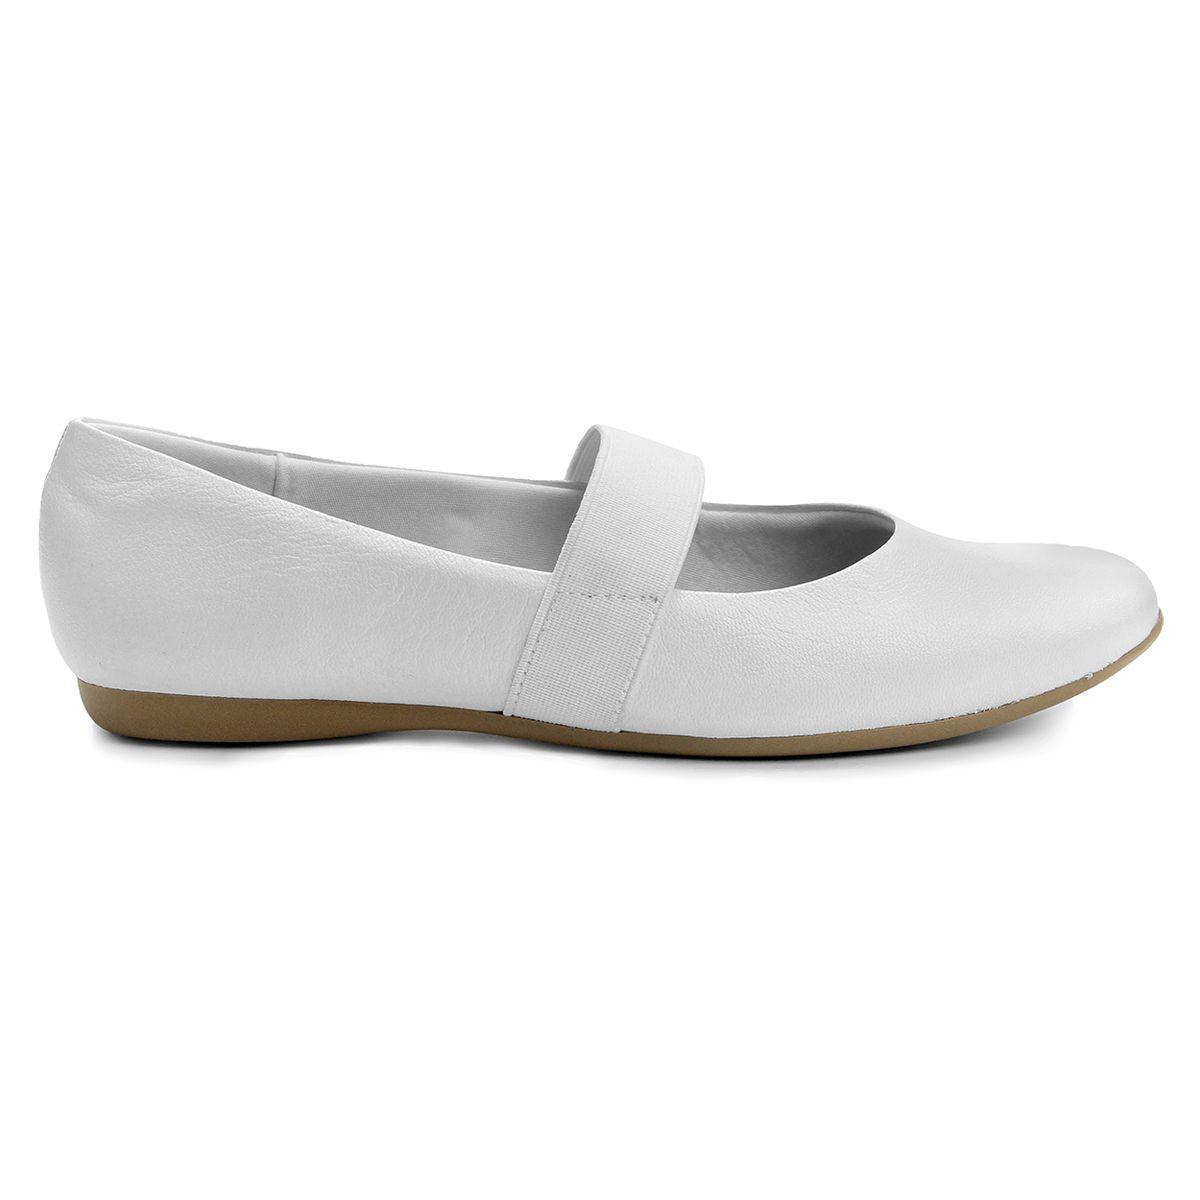 3e356538b Compre Sapatilha Usaflex Elástico Branco na Zattini a nova loja de moda  online…